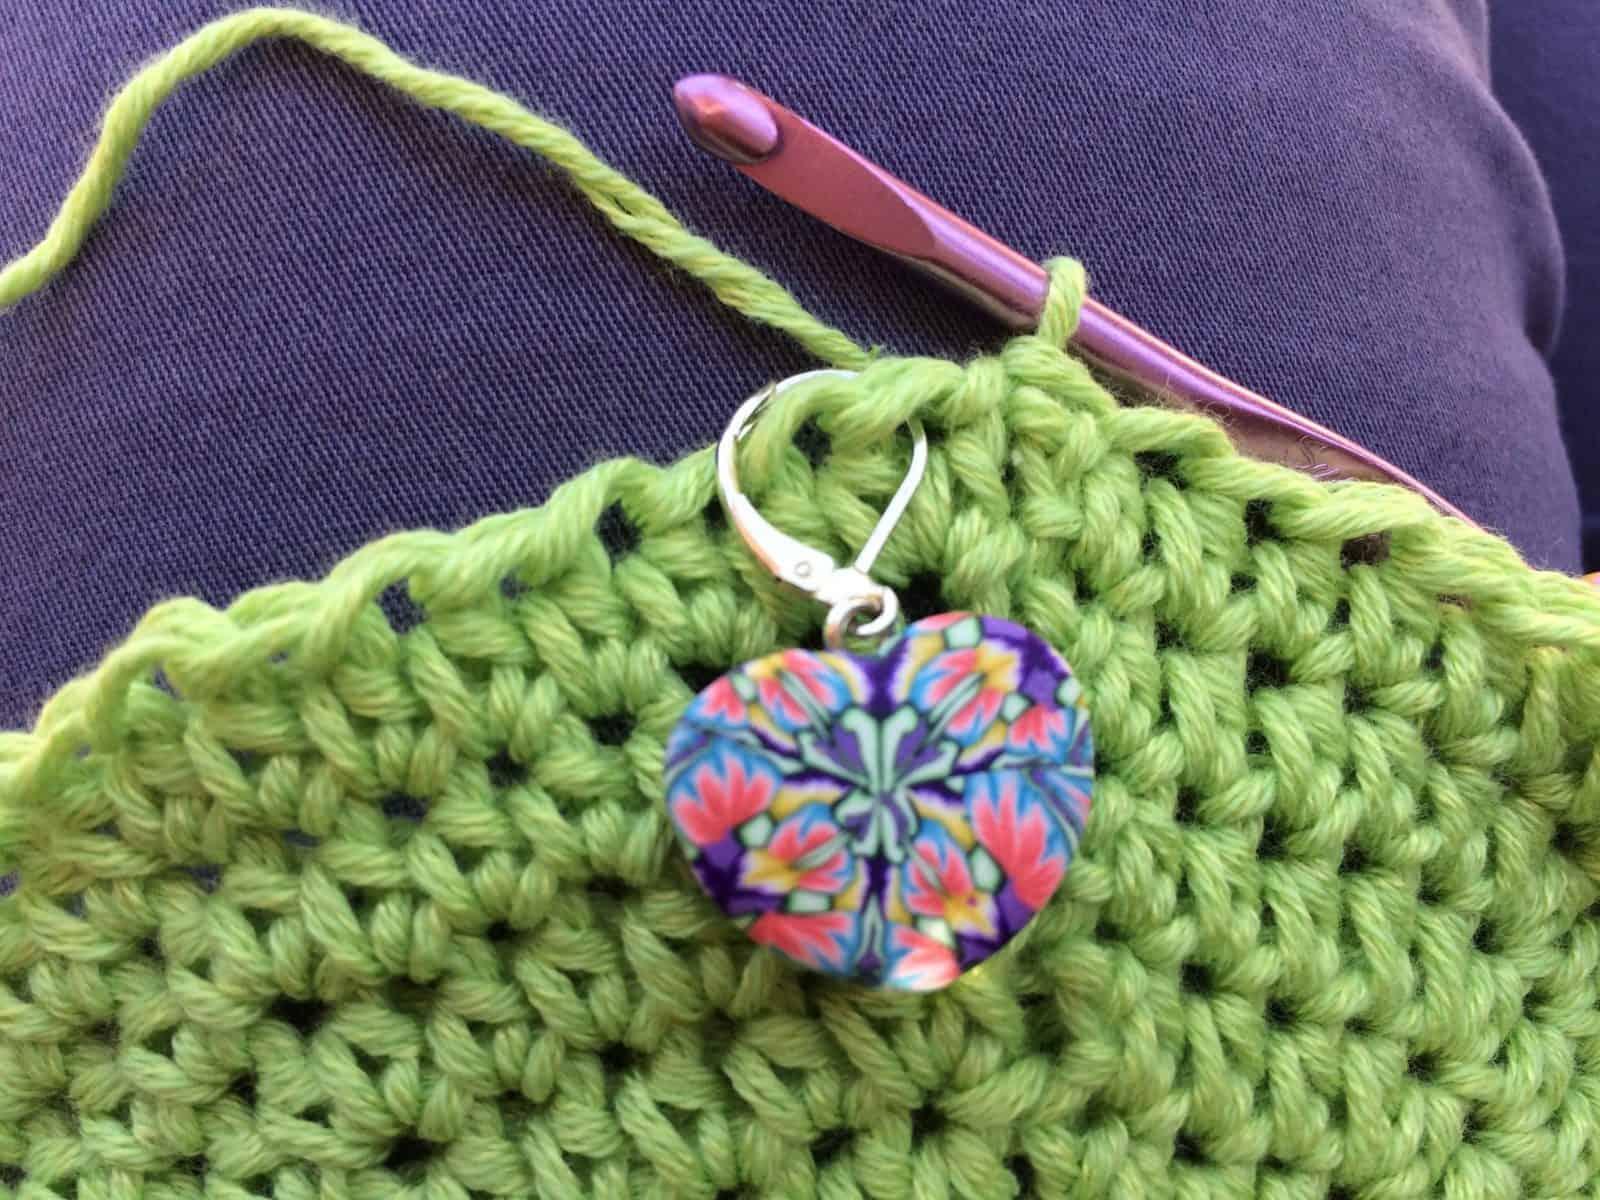 Heart stitch marker to keep track of first stitch.